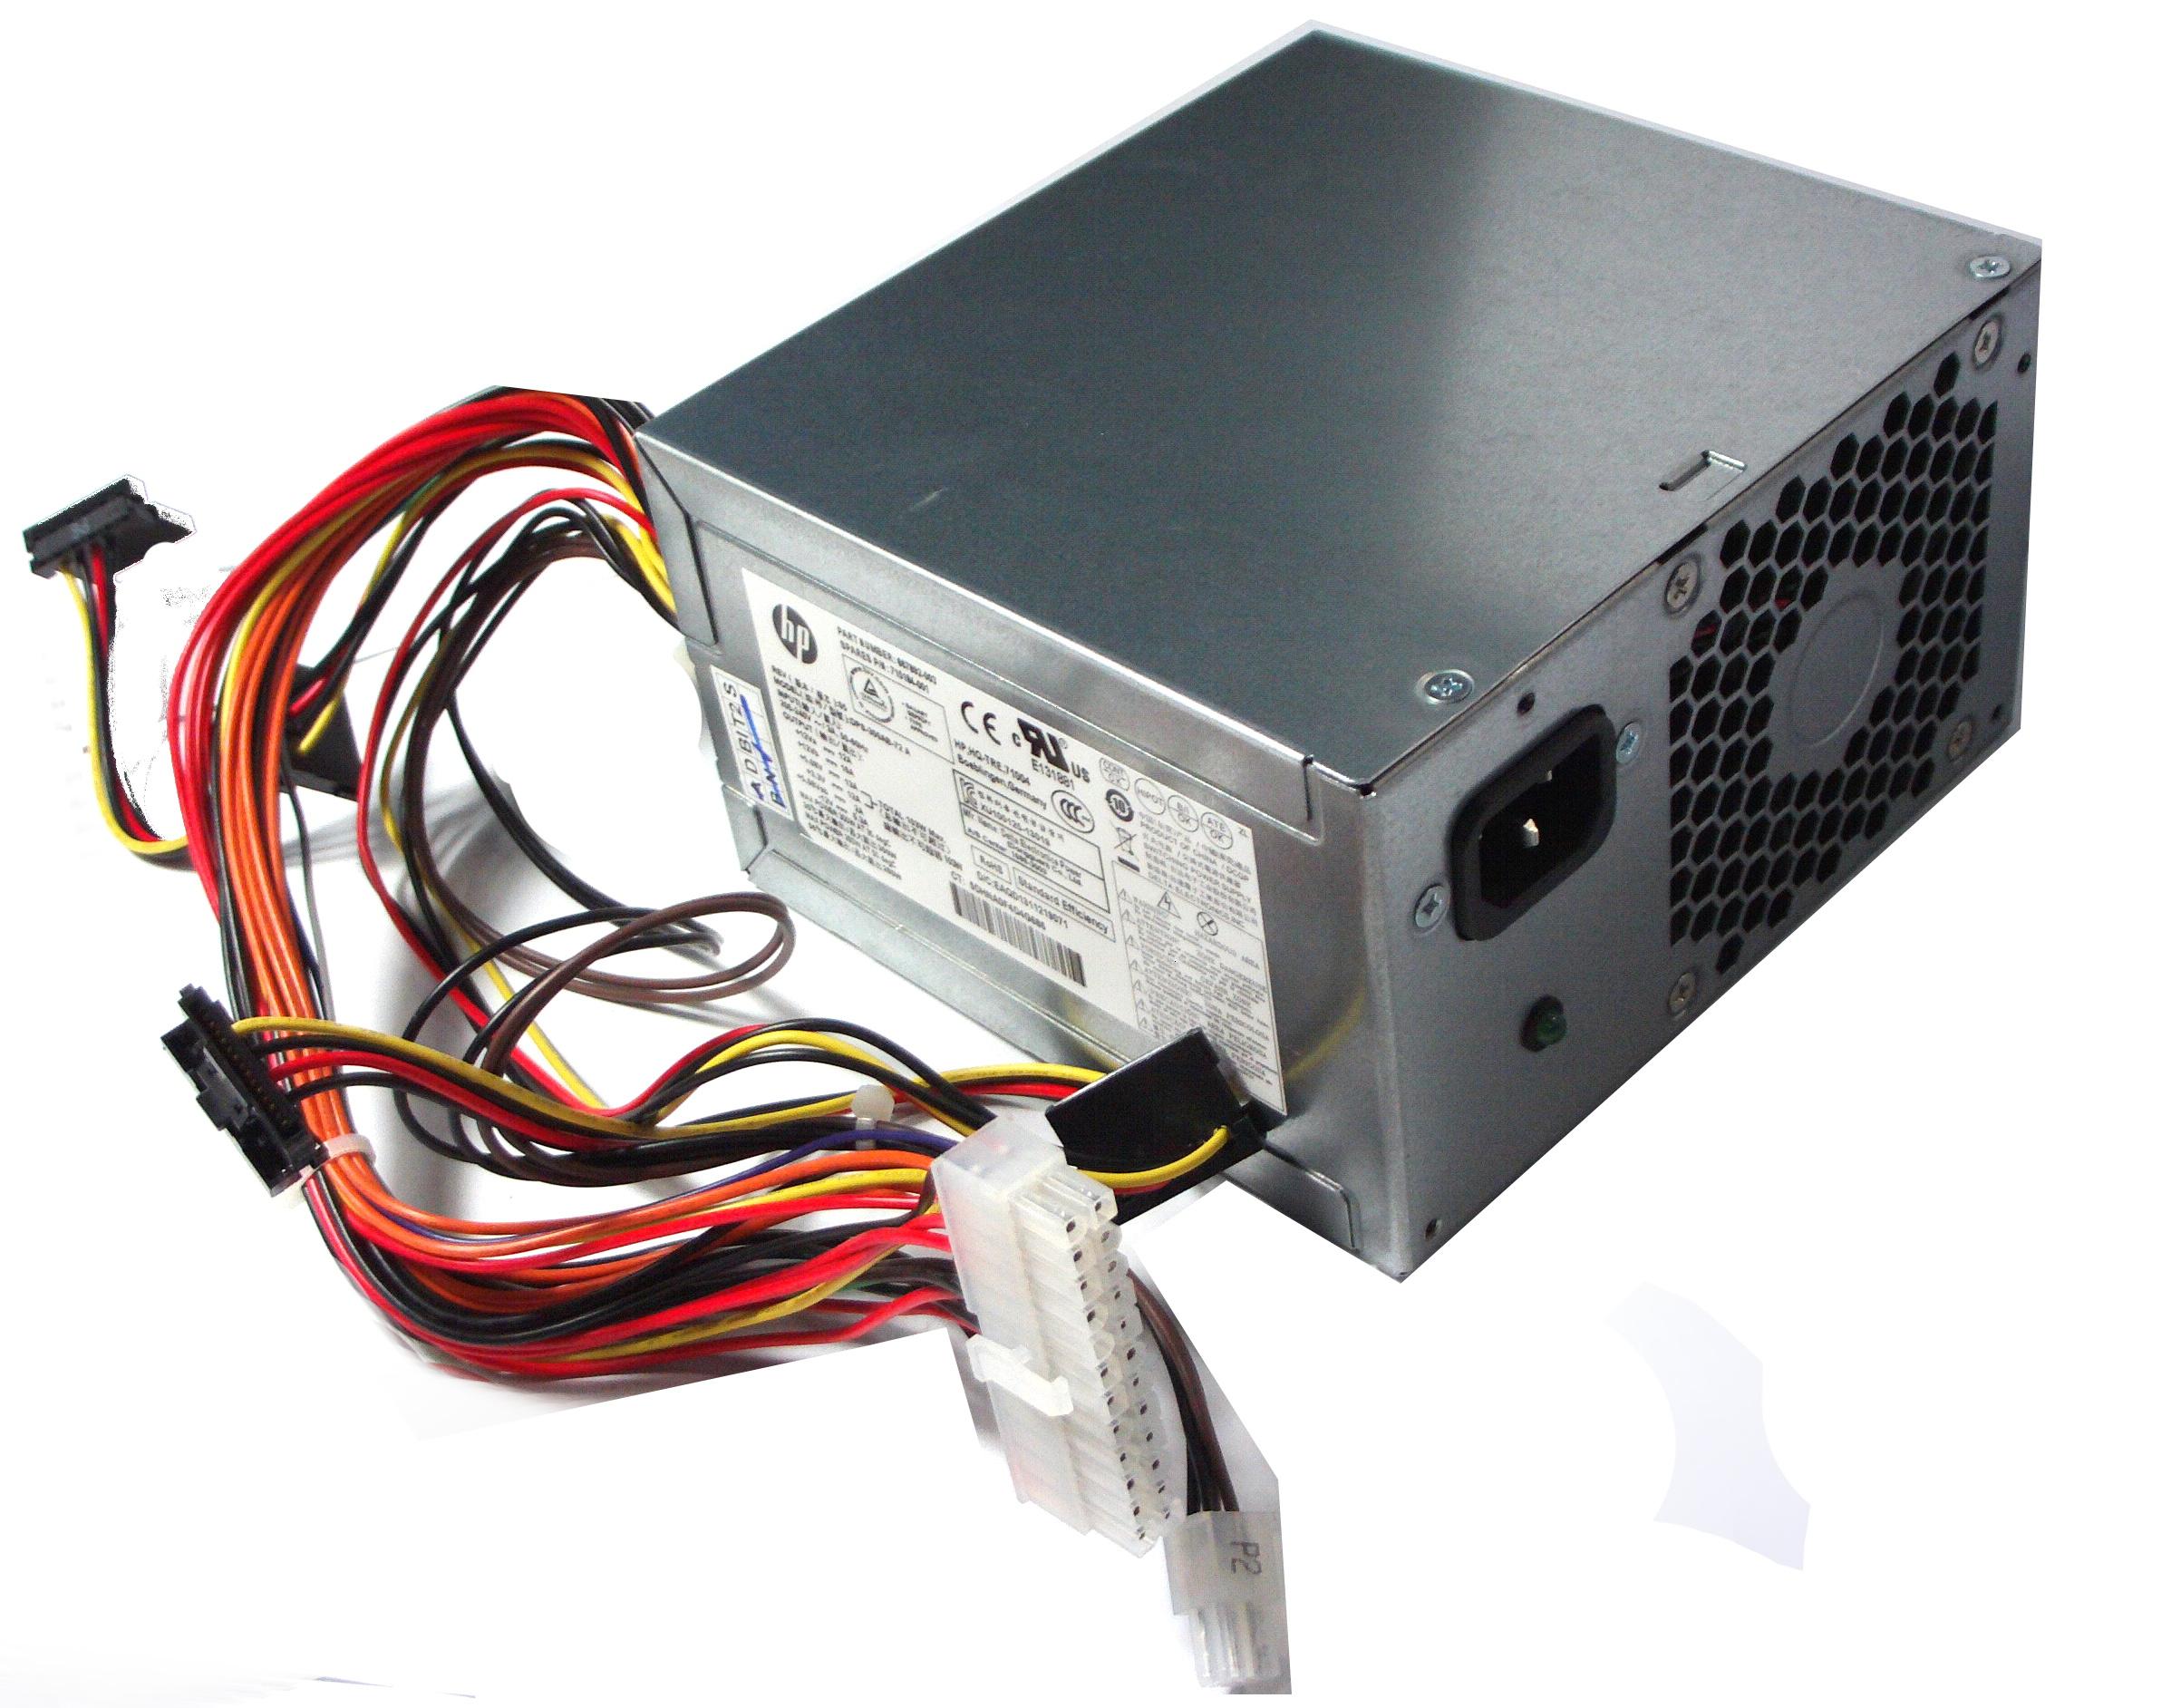 HP 667892-003 DPS-300AB-72 Pro 3515 MT Series 300W 24-Pin ATX Power Supply